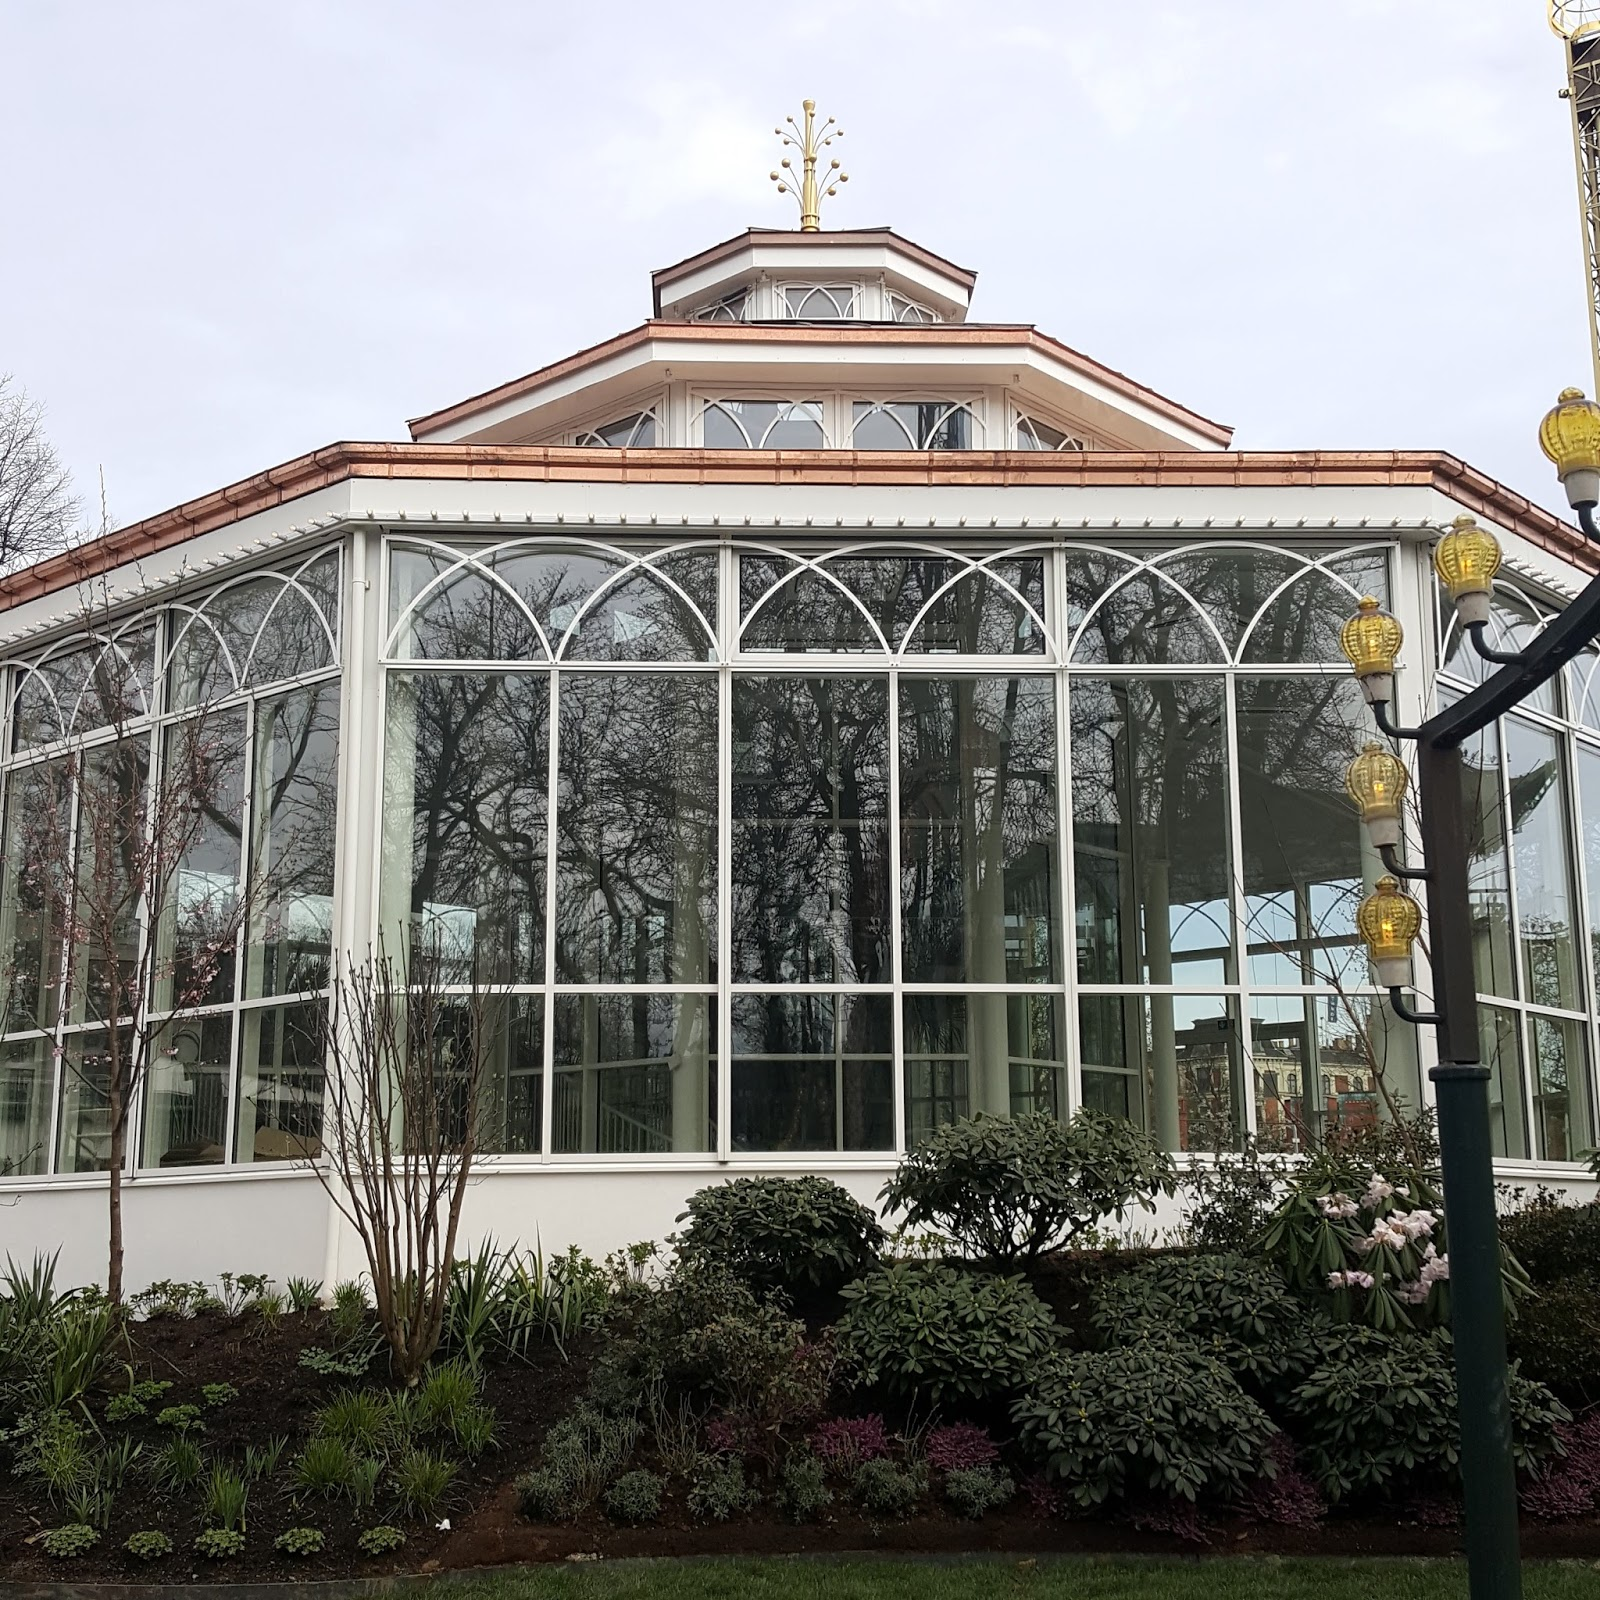 Sussi's Sussinghurst: Tivoli åbner